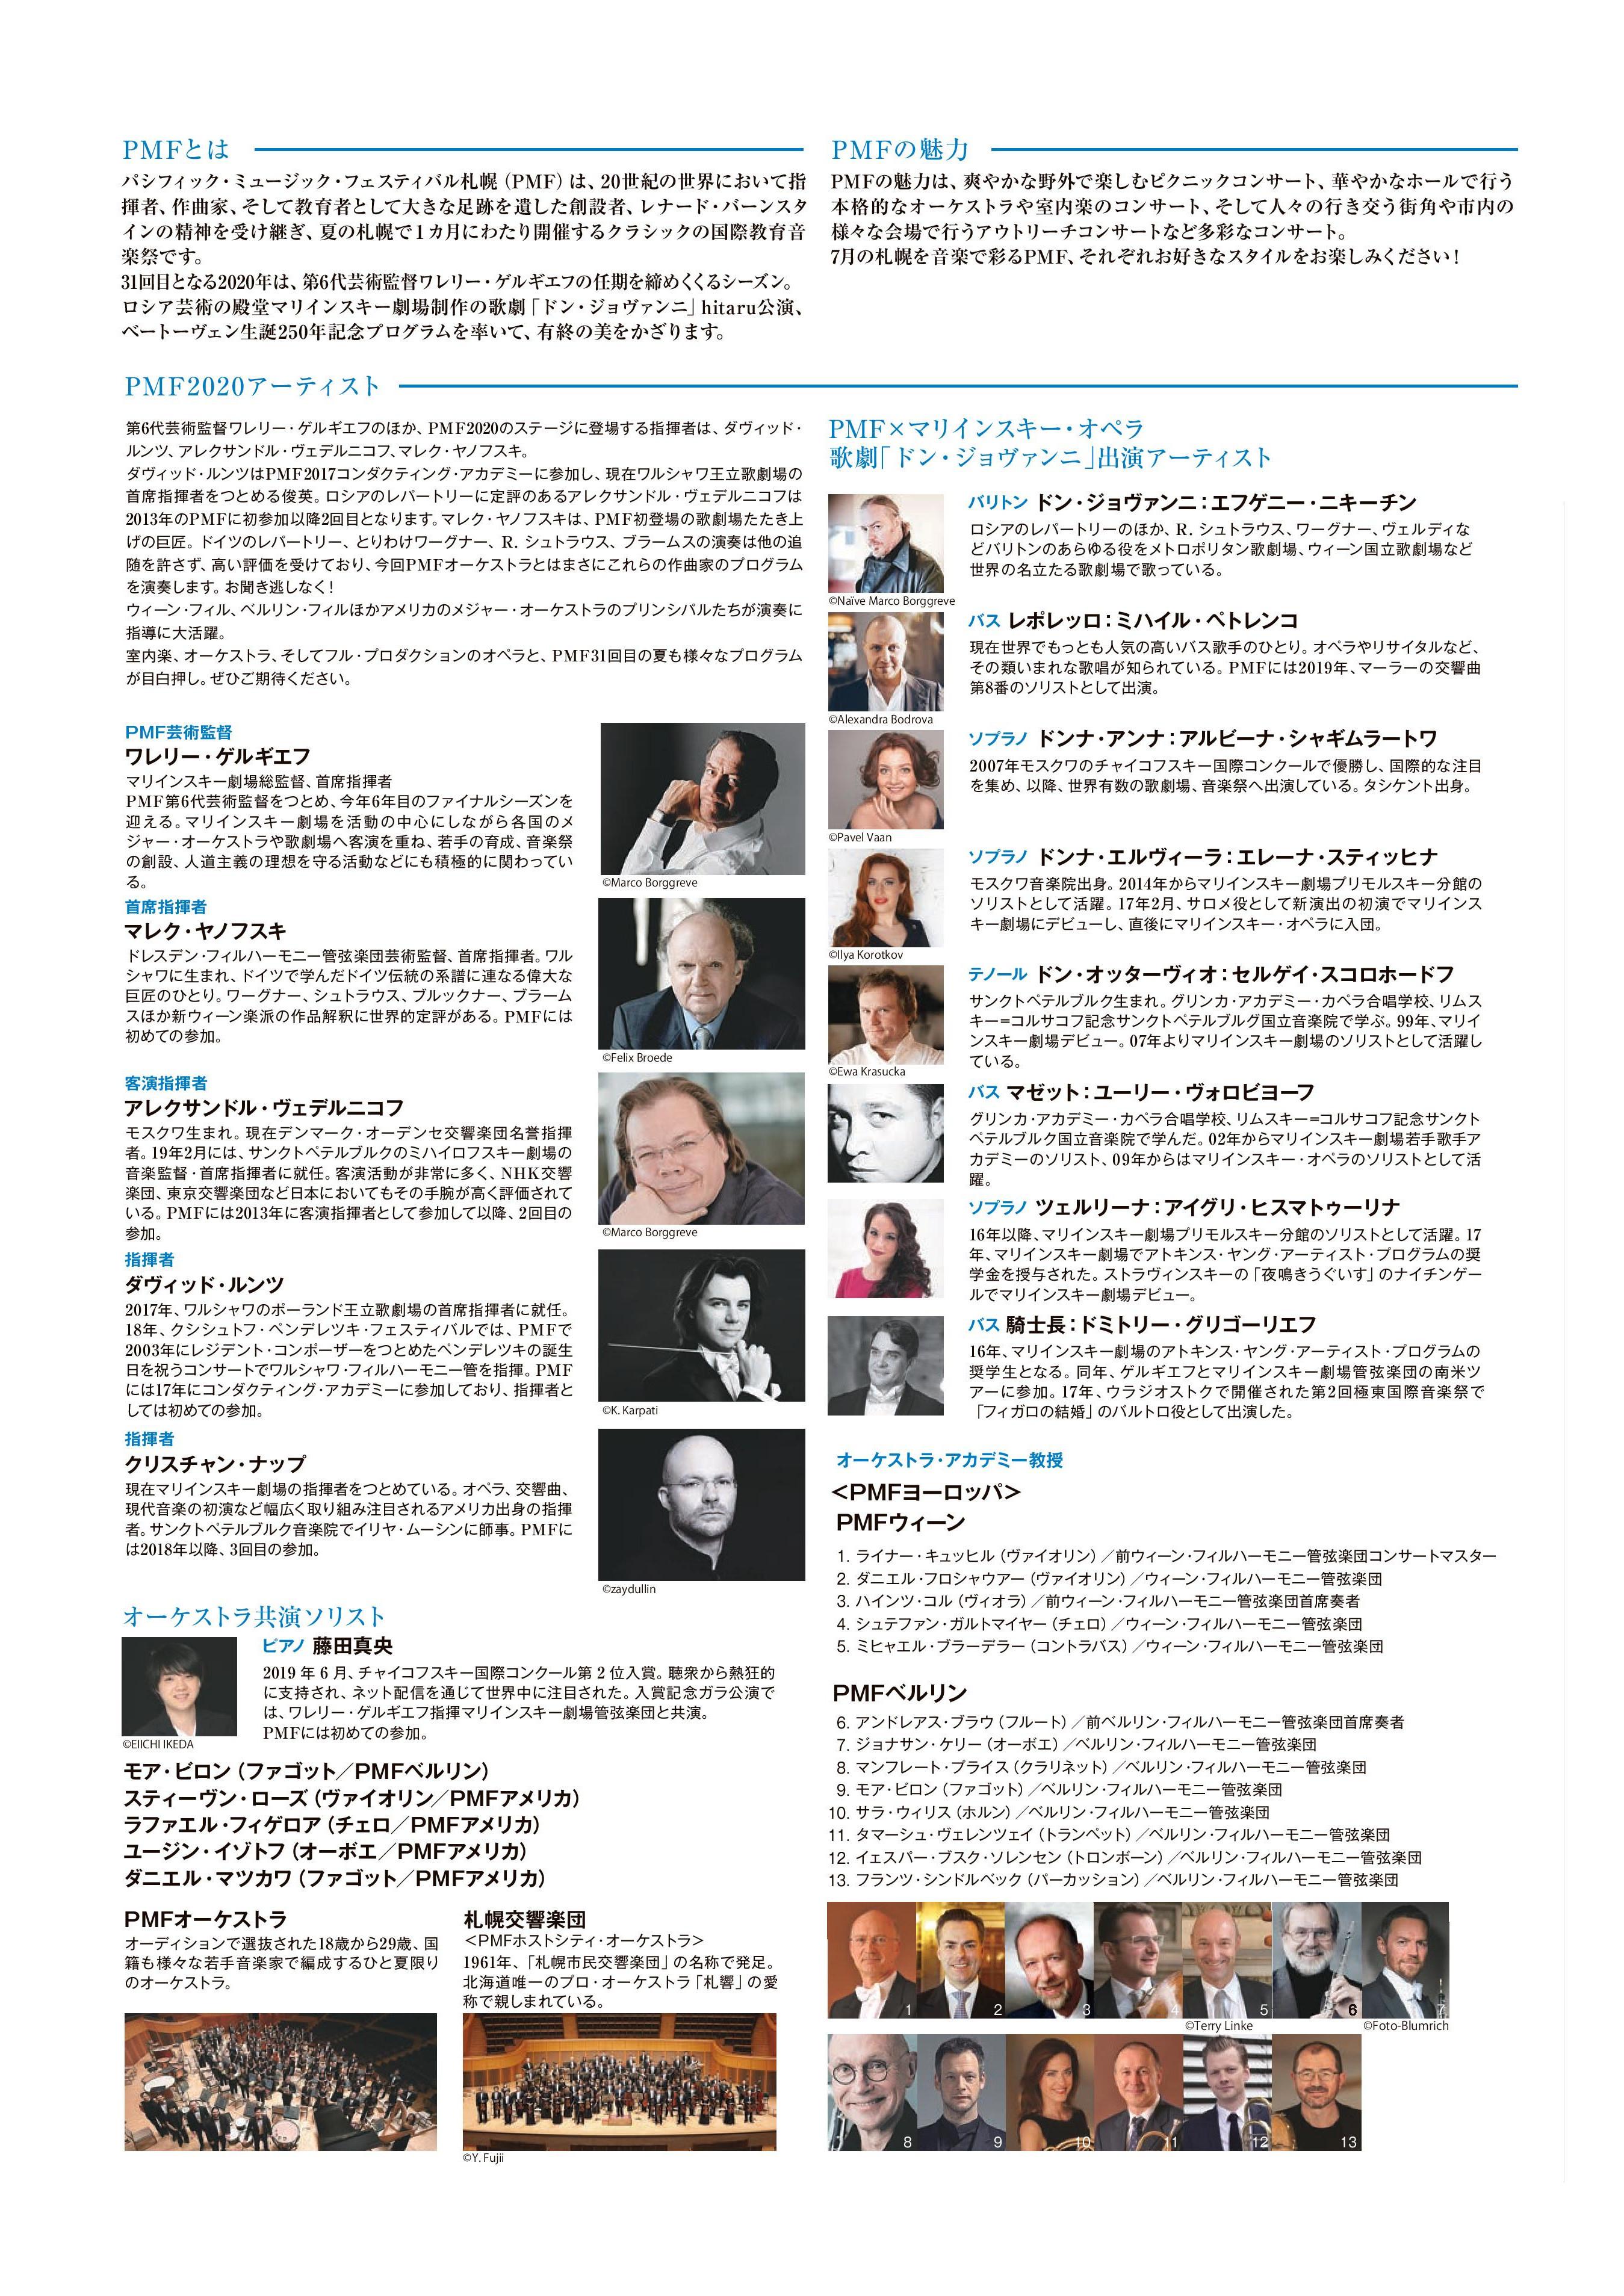 PMF2020 公演スケジュール【裏面】(第1版) 3枚目